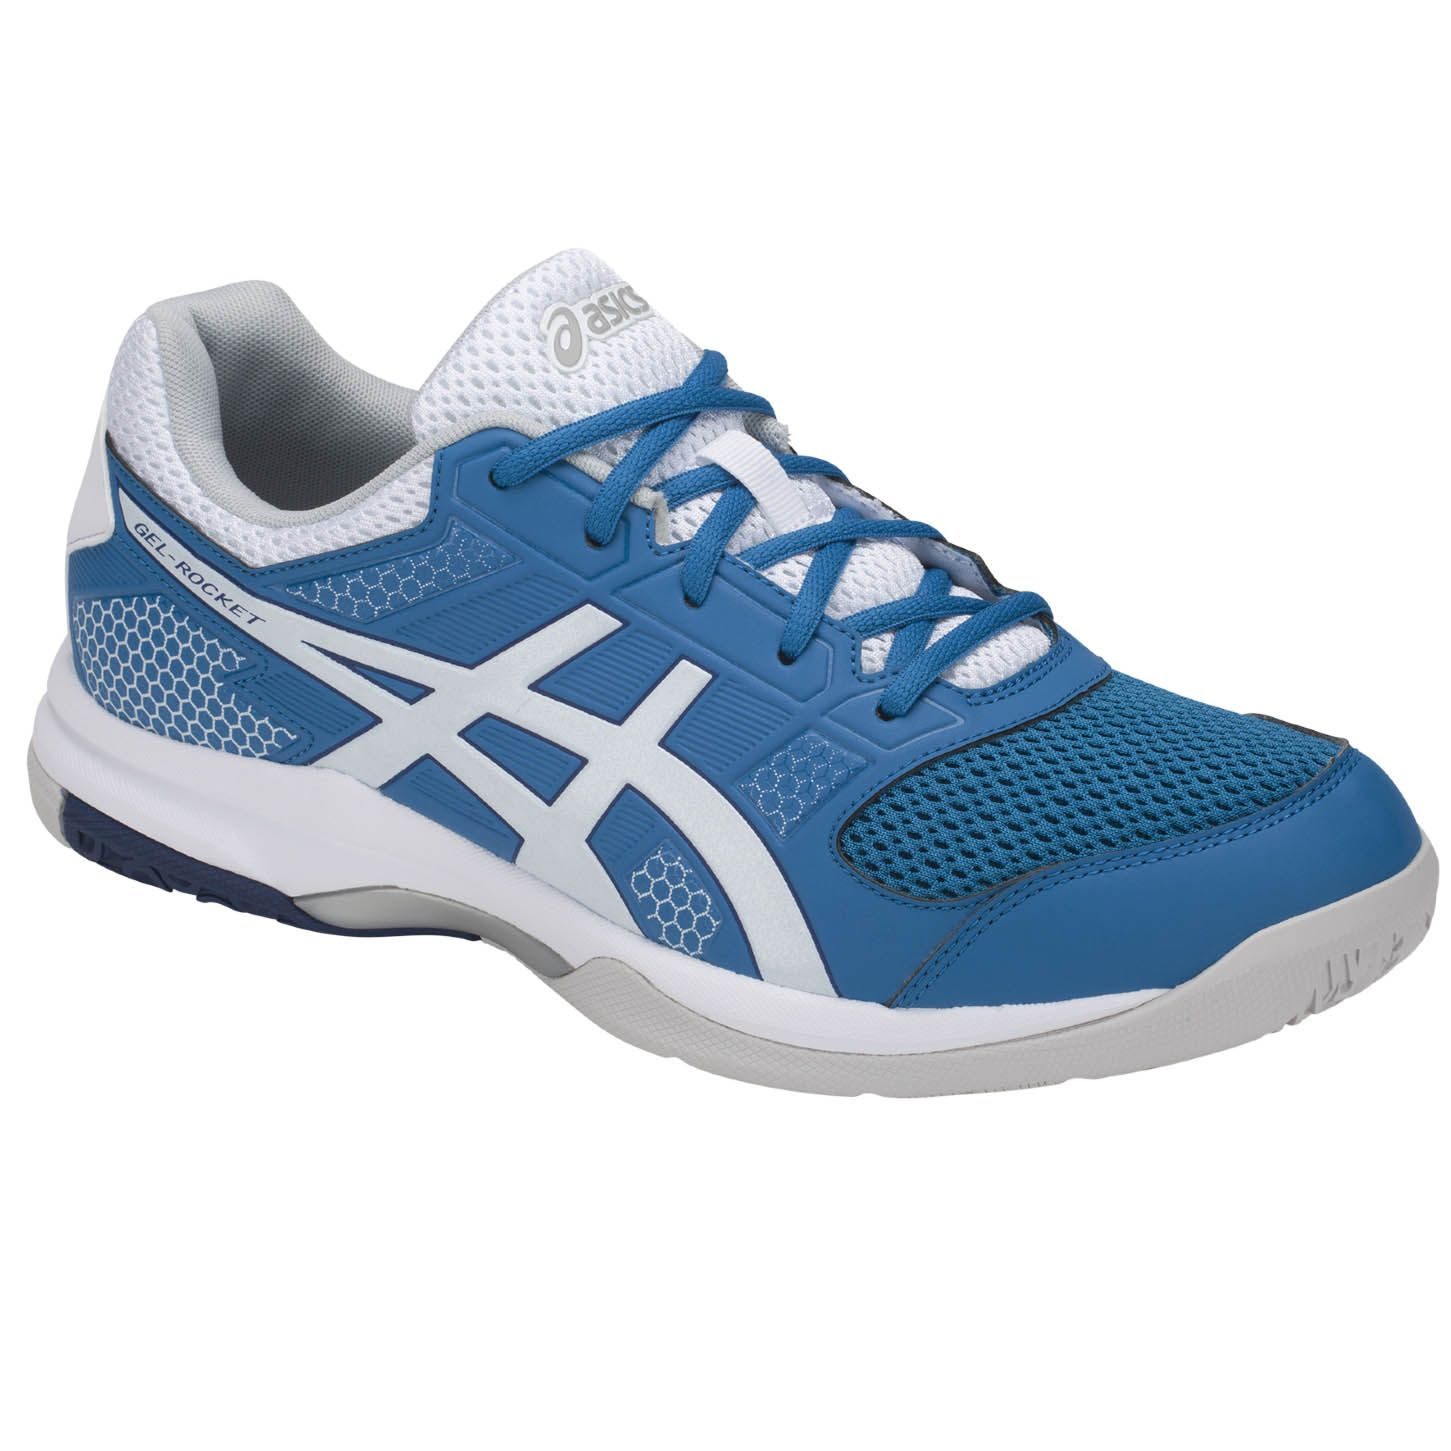 Asics Indoor Court Shoes Sale